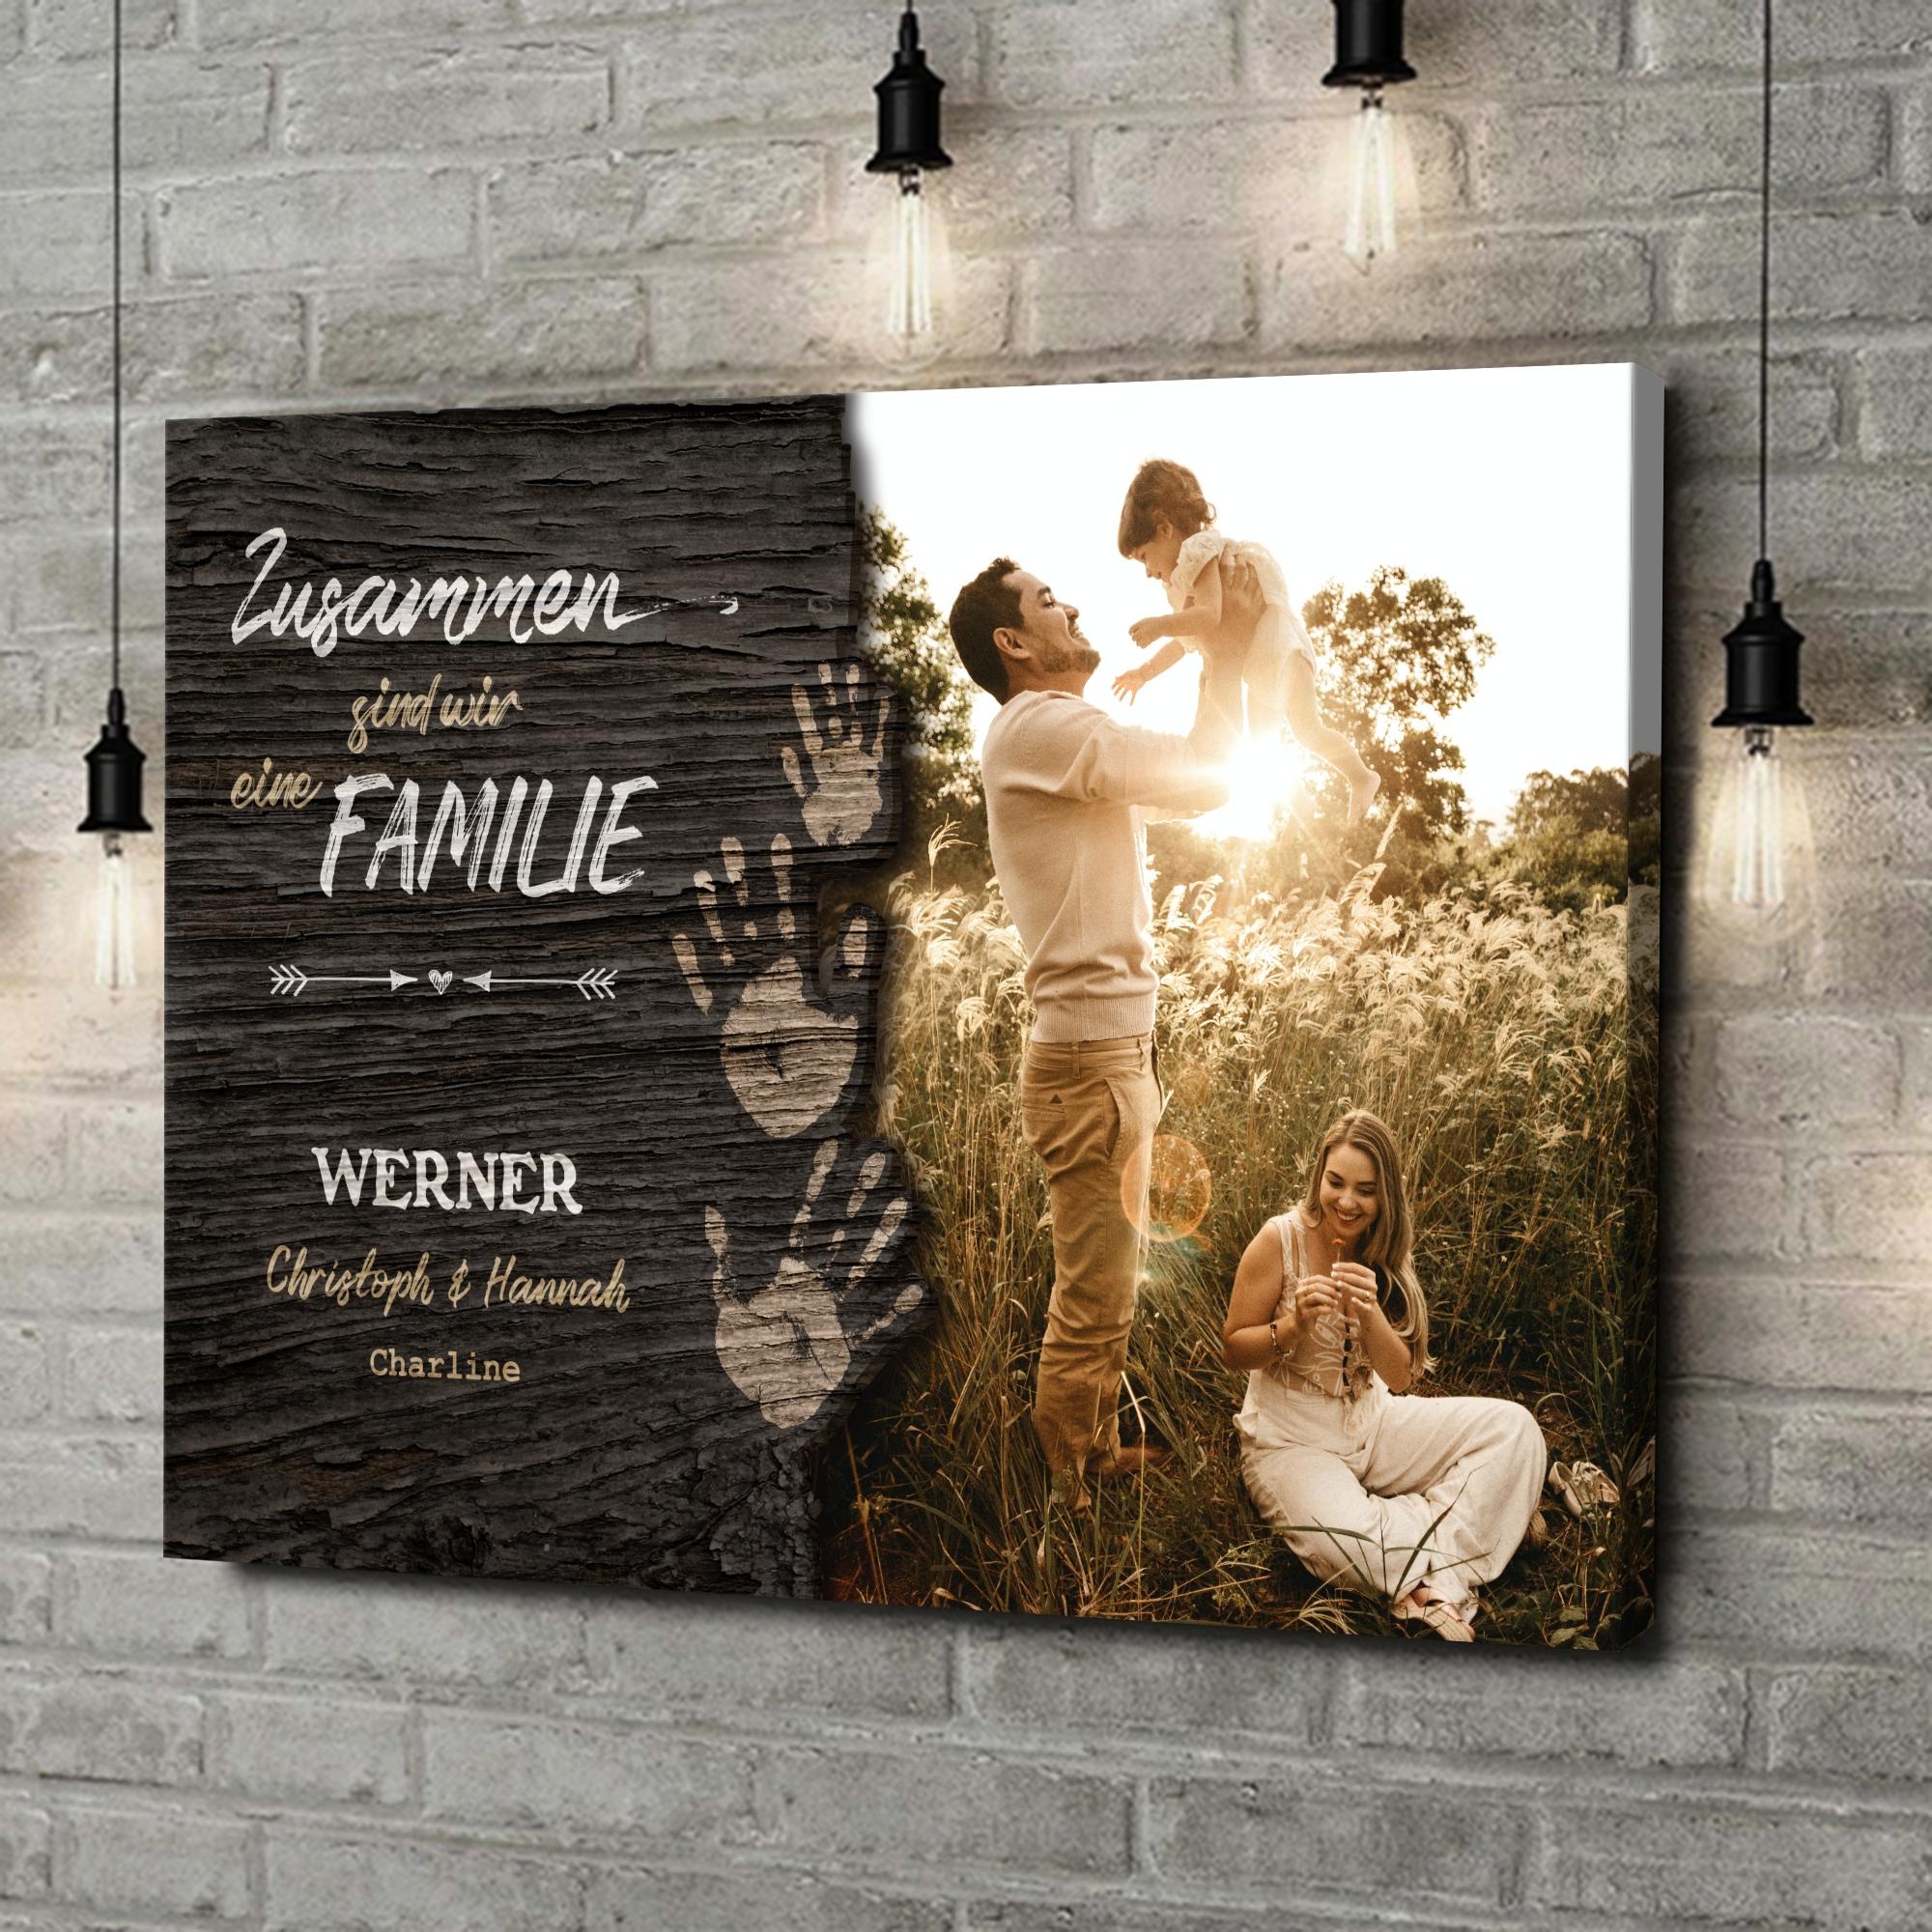 Leinwandbild personalisiert Unsere Familie